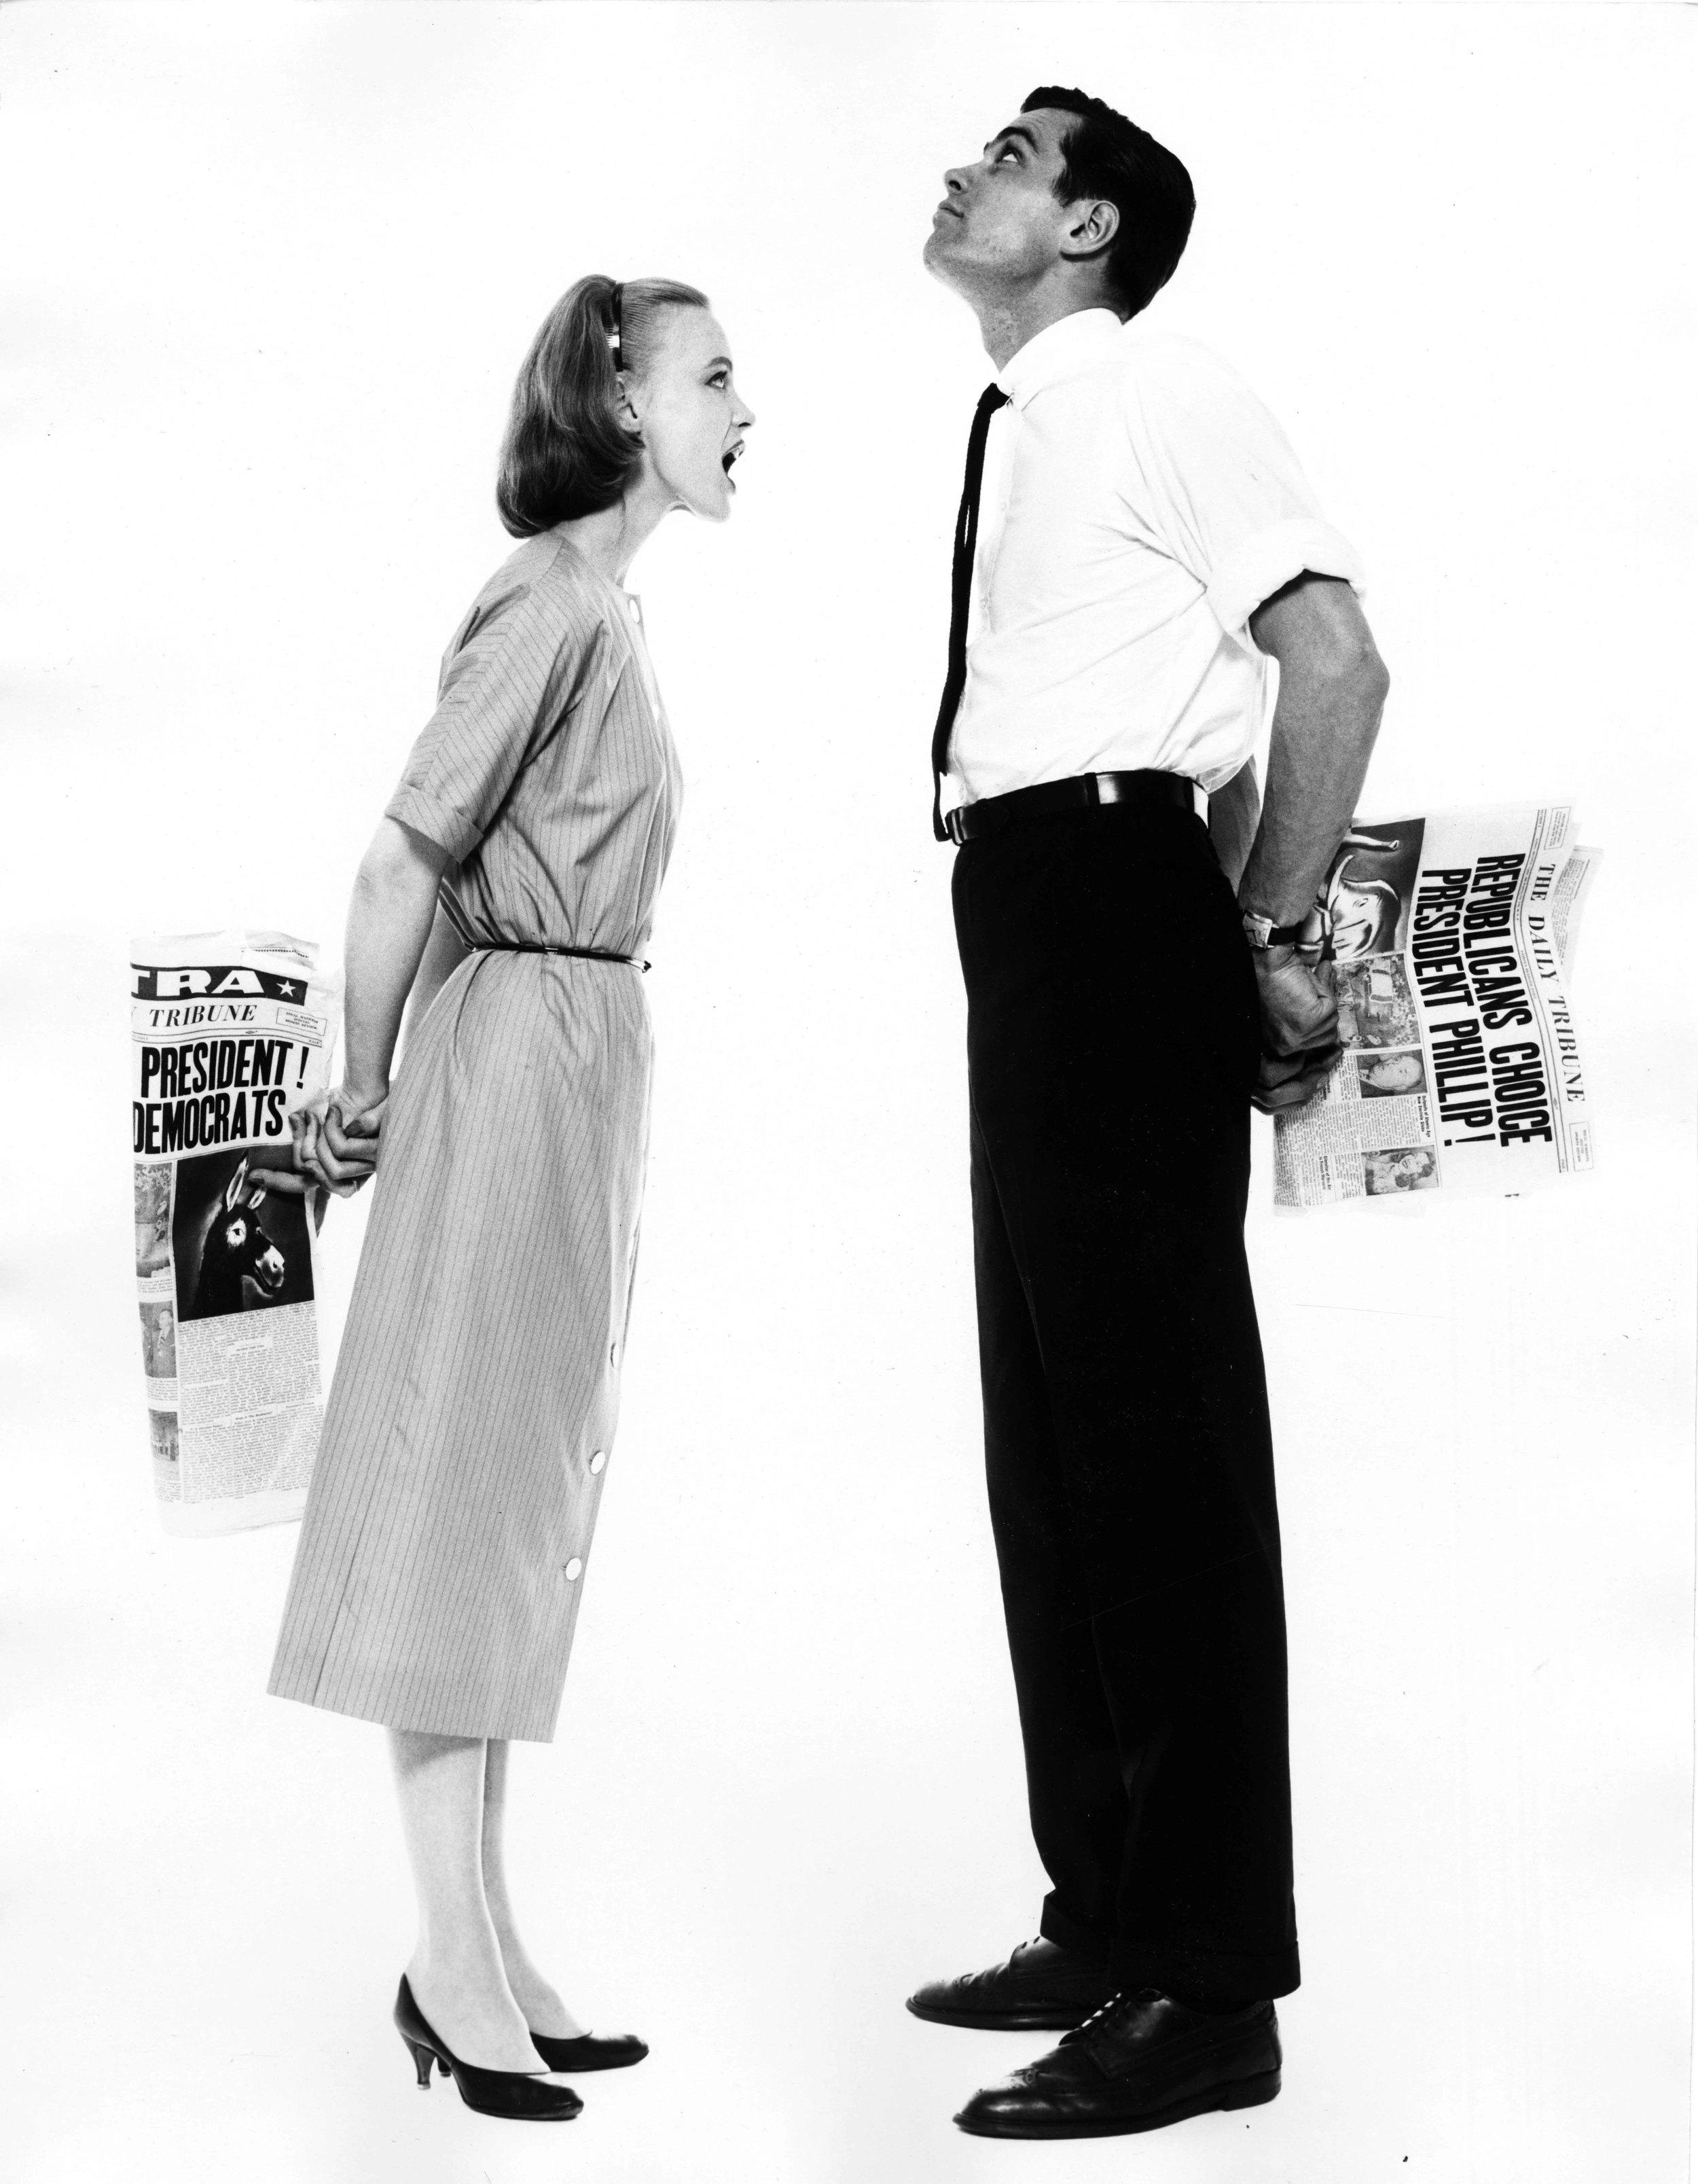 16_25_Woman and man holding newspaper behind their backs_Dan Wynn Archive.jpeg